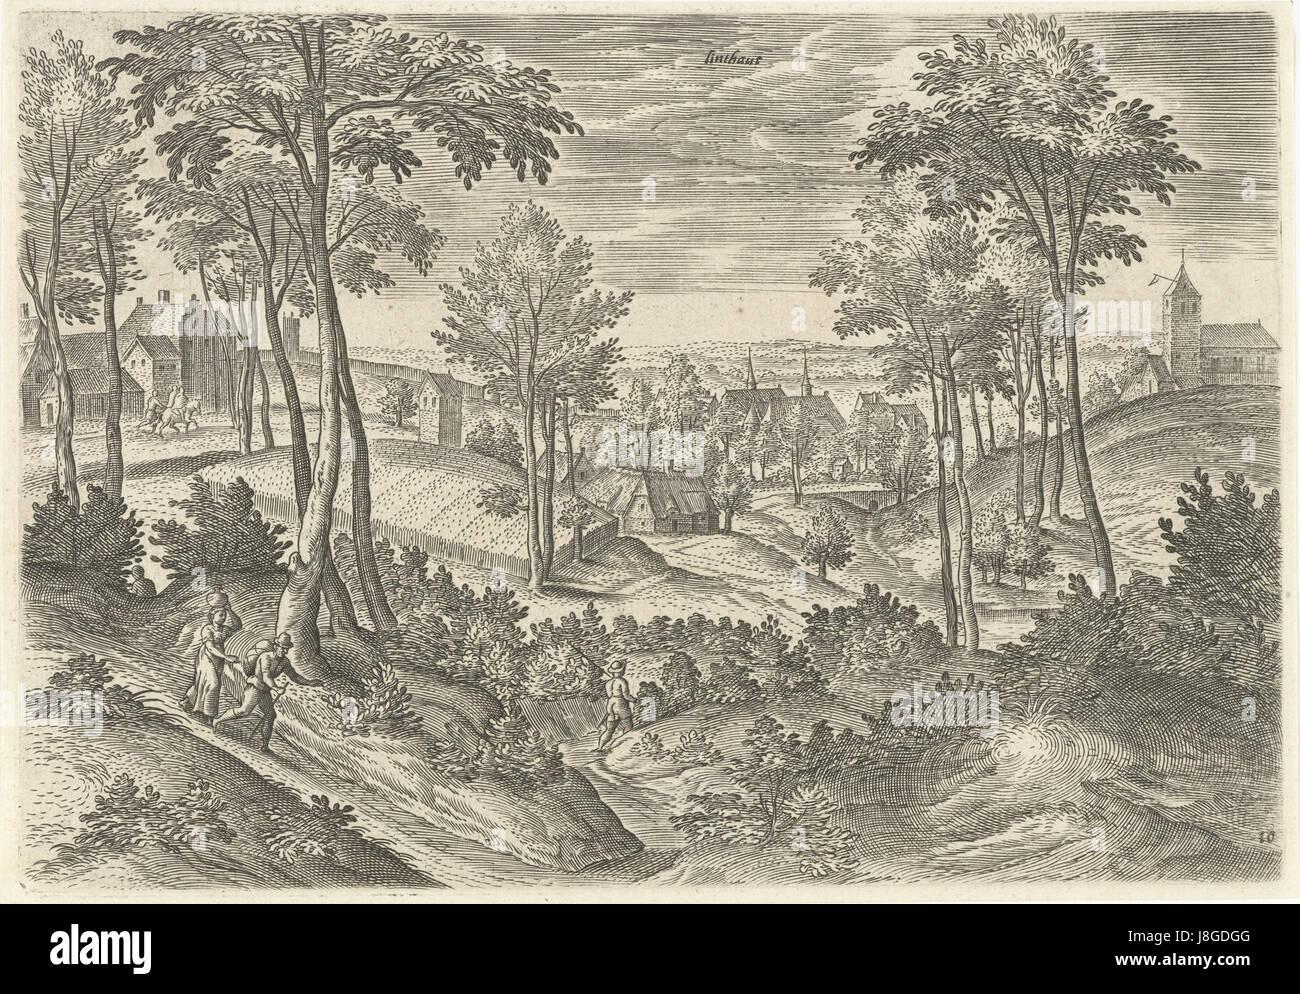 Gezicht op Linthout, Hans Collaert (I), naar Hans Bol, Jacob Grimmer, 1530   1580 - Stock Image